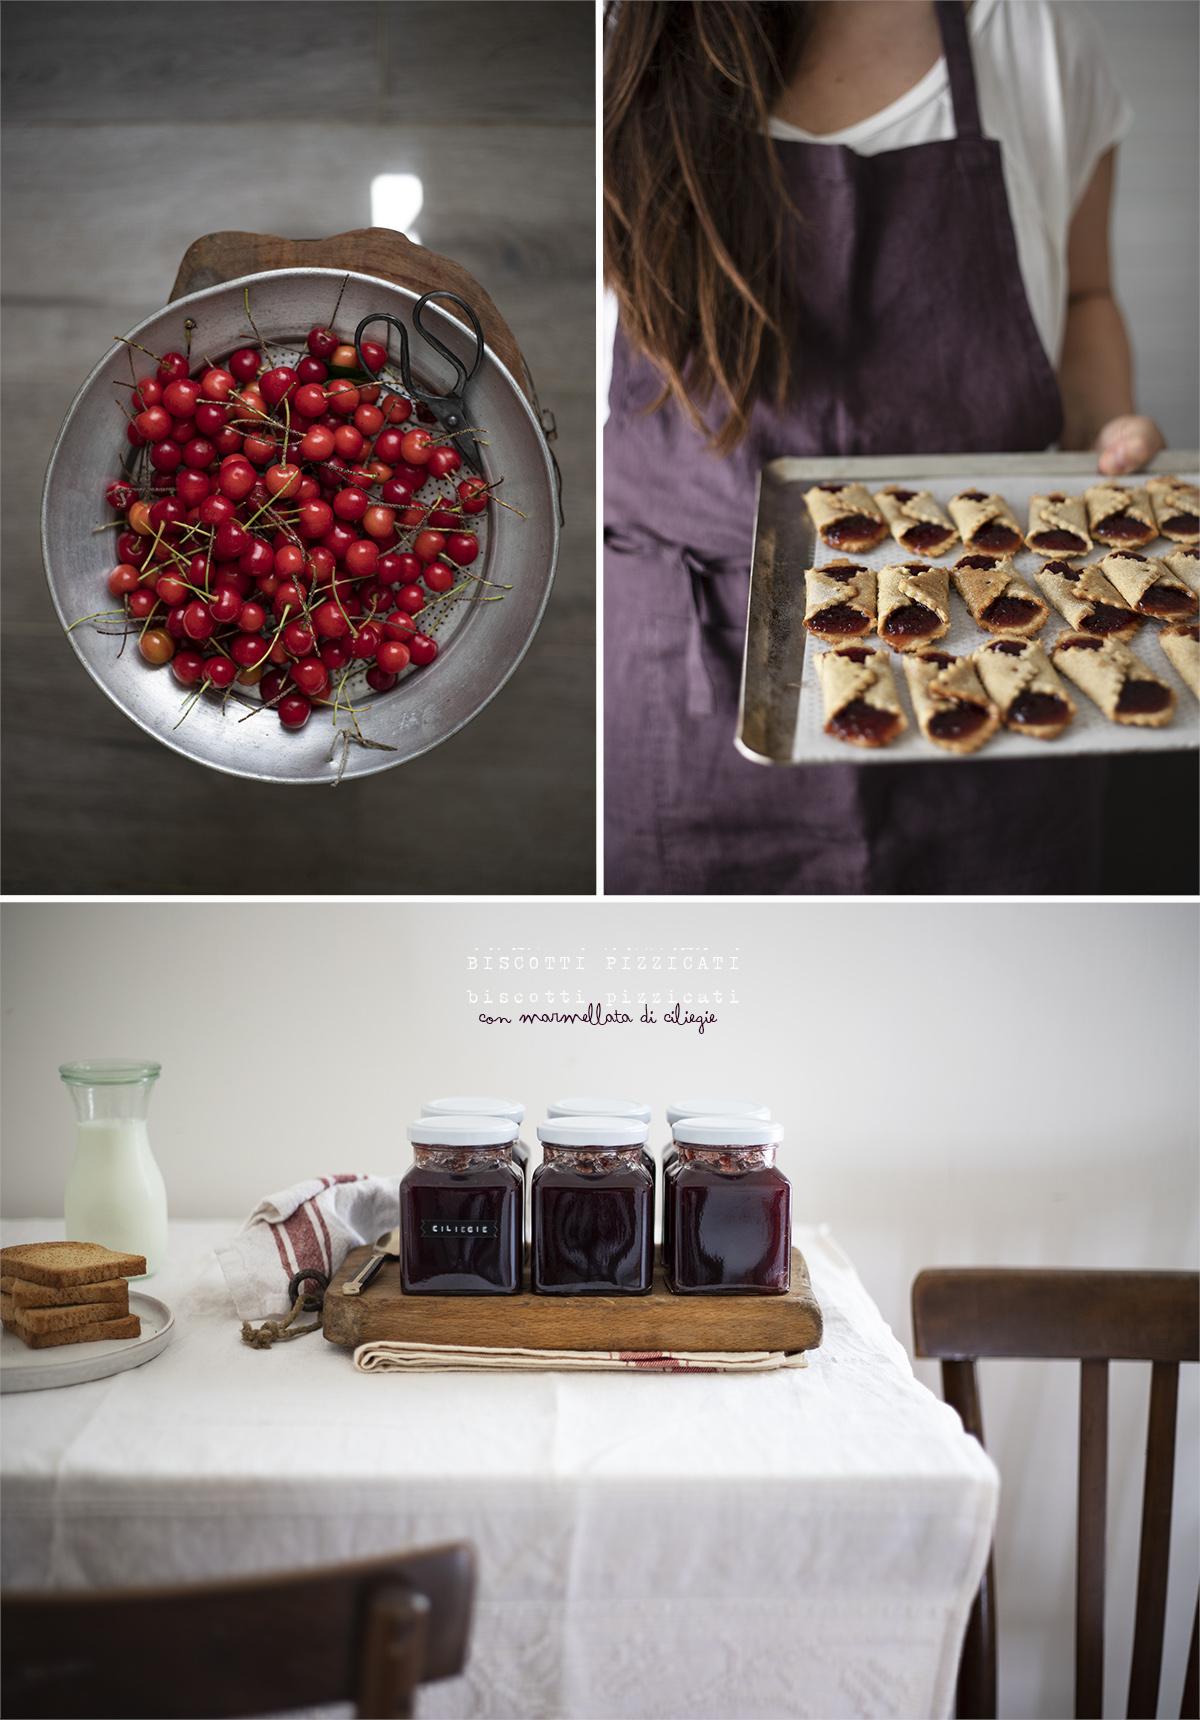 biscotti pizzicati e marmellata di ciliegie